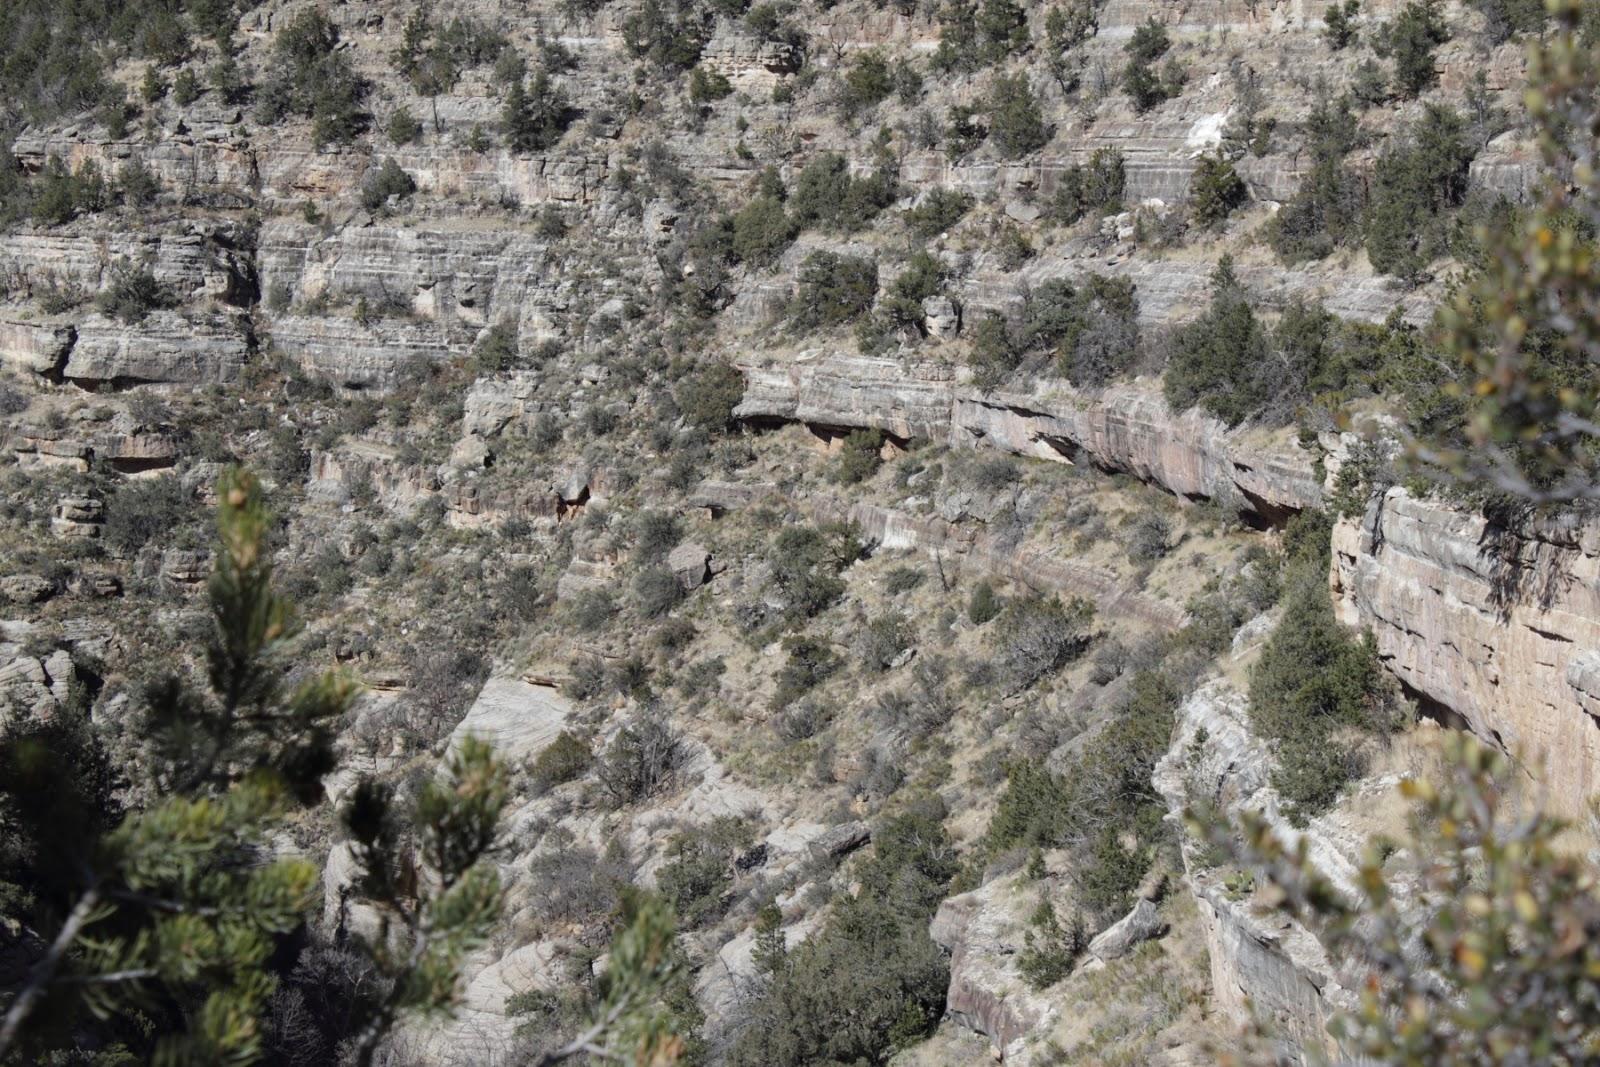 Sinagua cliff dwellings in Walnut Canyon